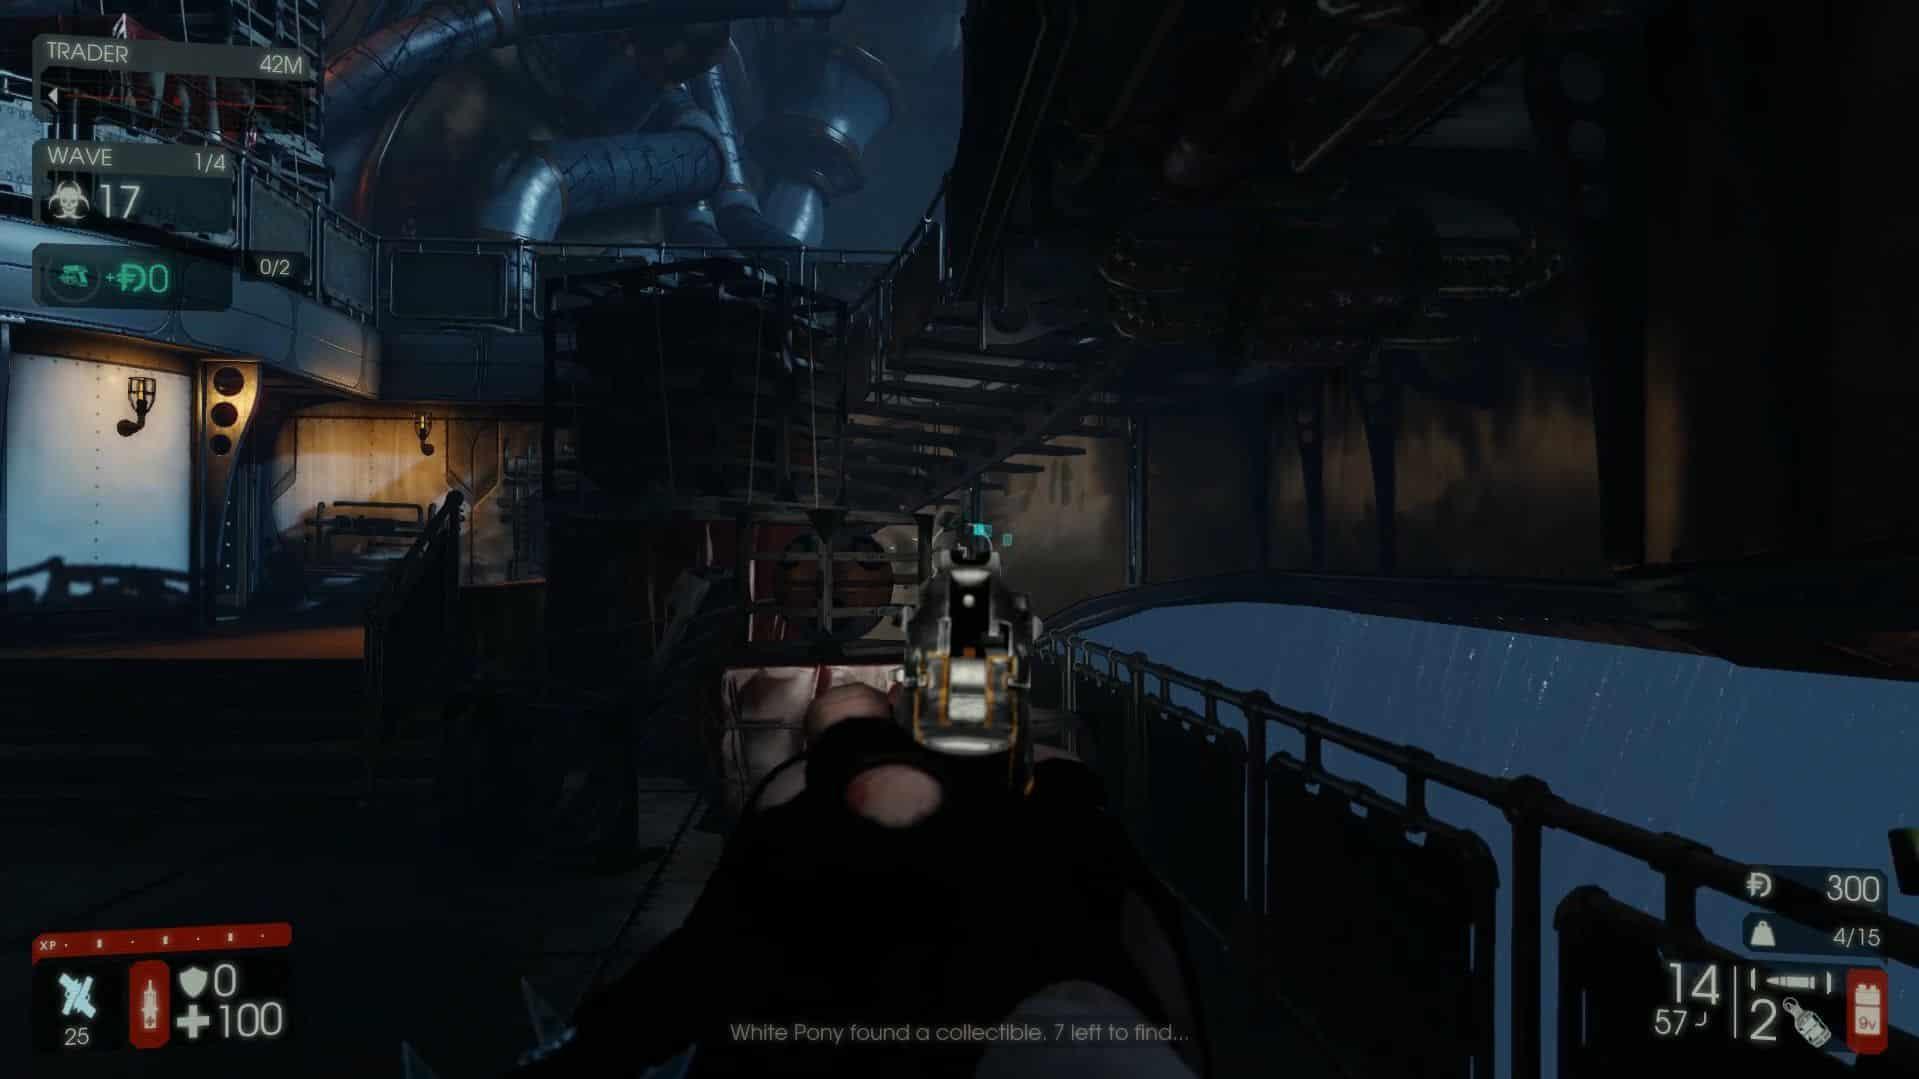 Killing Floor 2, Airship Collectibles, Third Collectible